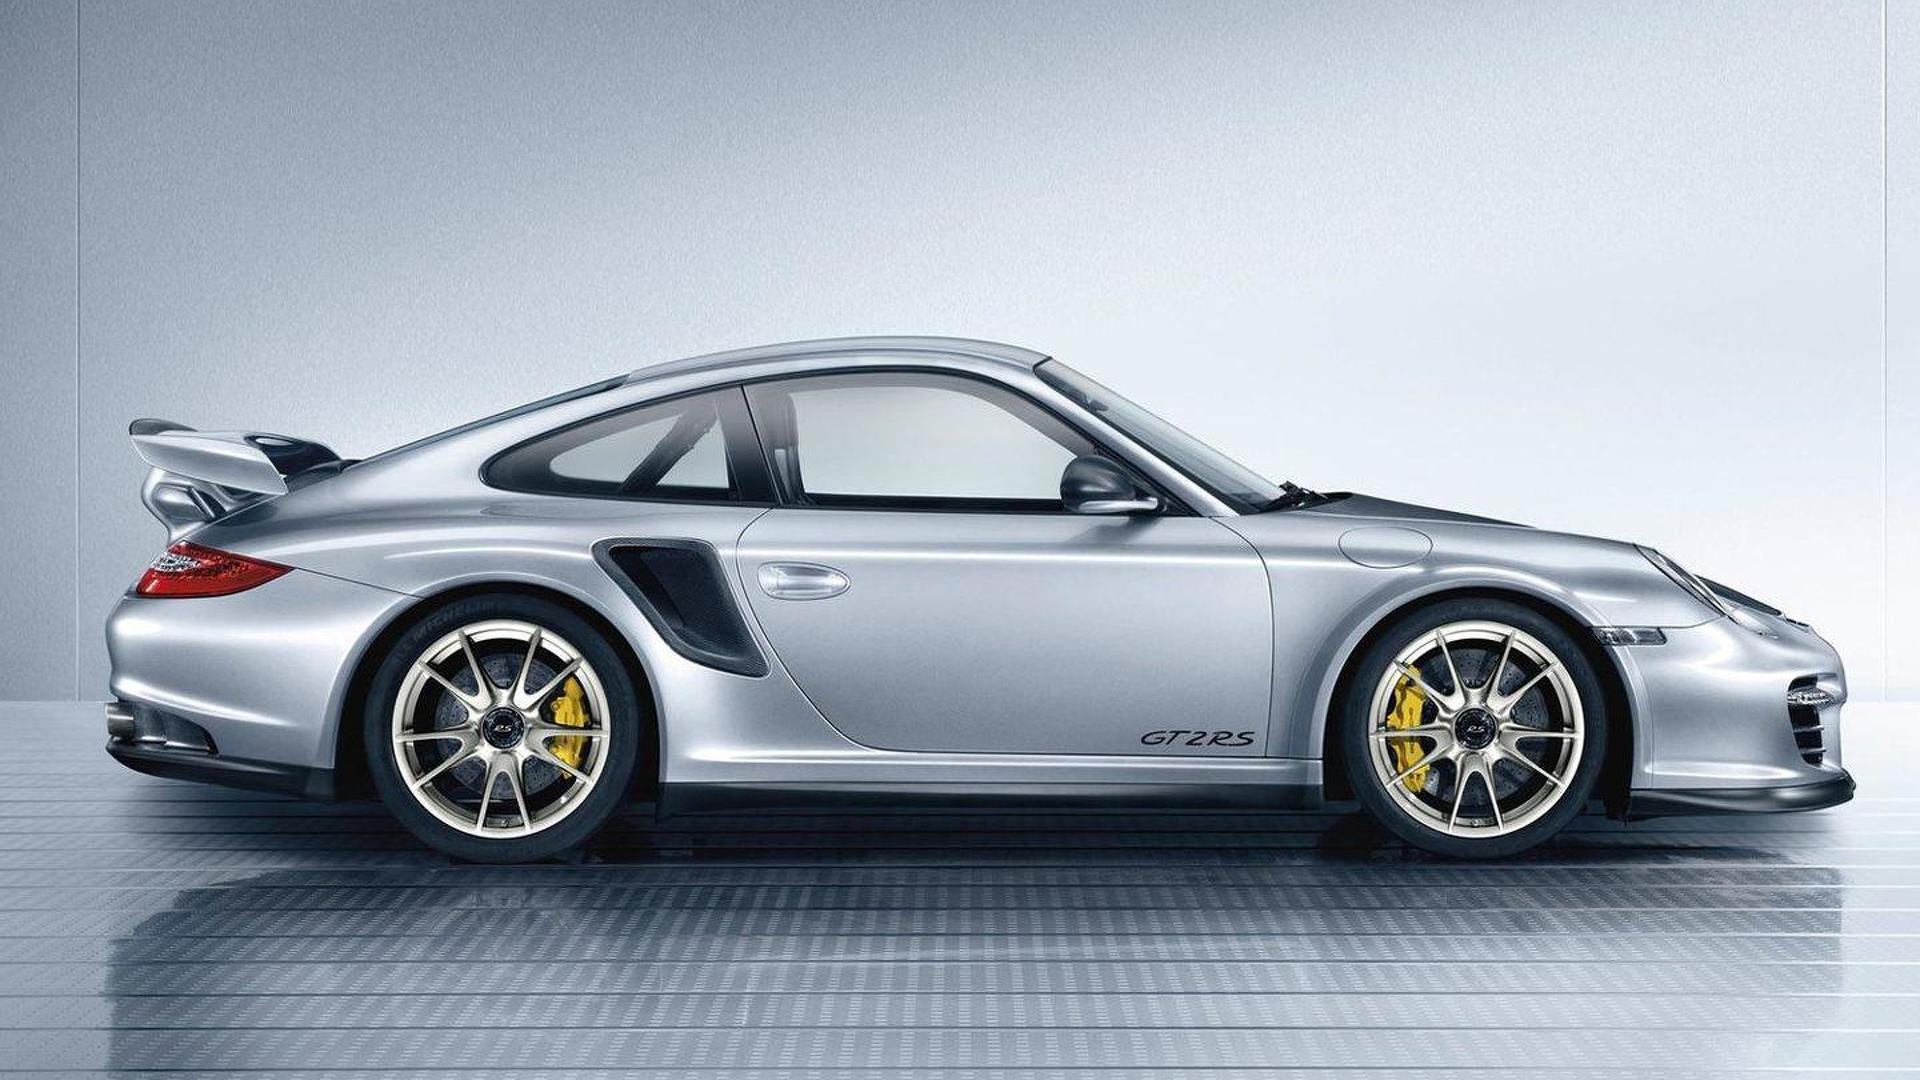 2010-253316-2011-porsche-911-gt2-rs-first-official-photos-12-05-20101 Astounding Porsche 911 Gt2 for Sale Canada Cars Trend